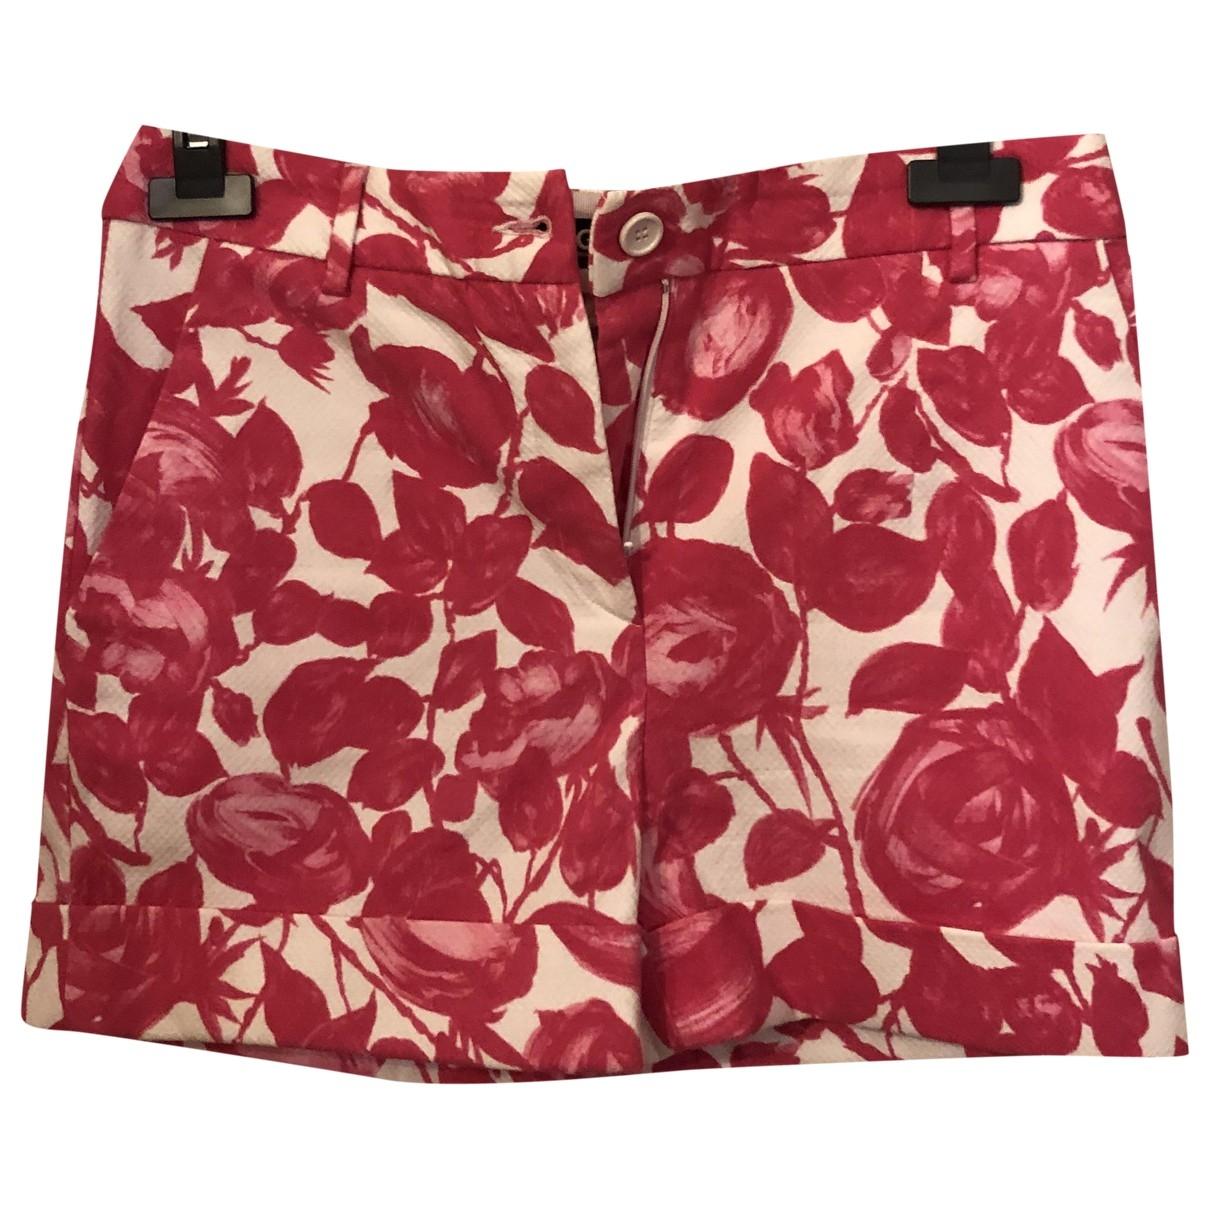 D&g \N Shorts in Baumwolle - Elasthan